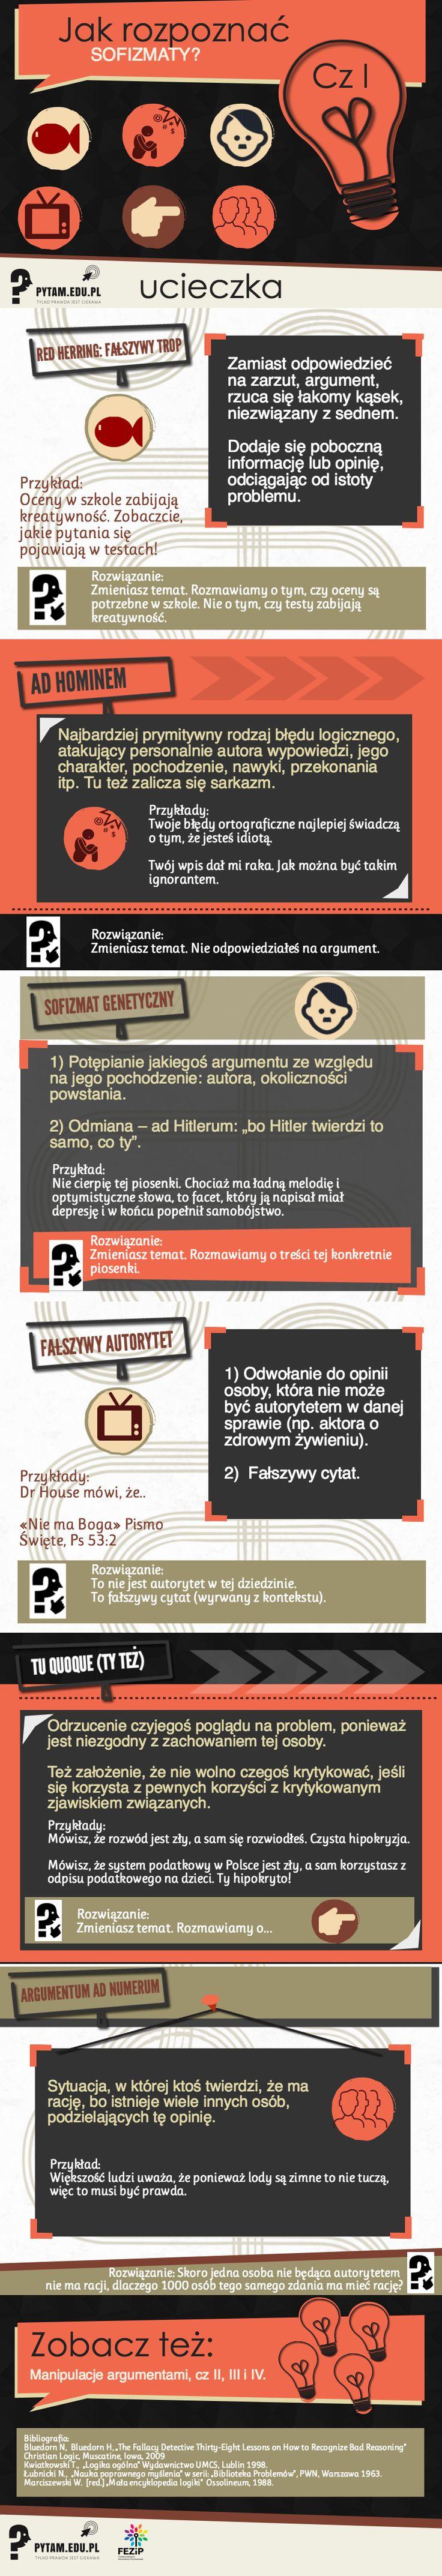 Sofizmaty - infografika